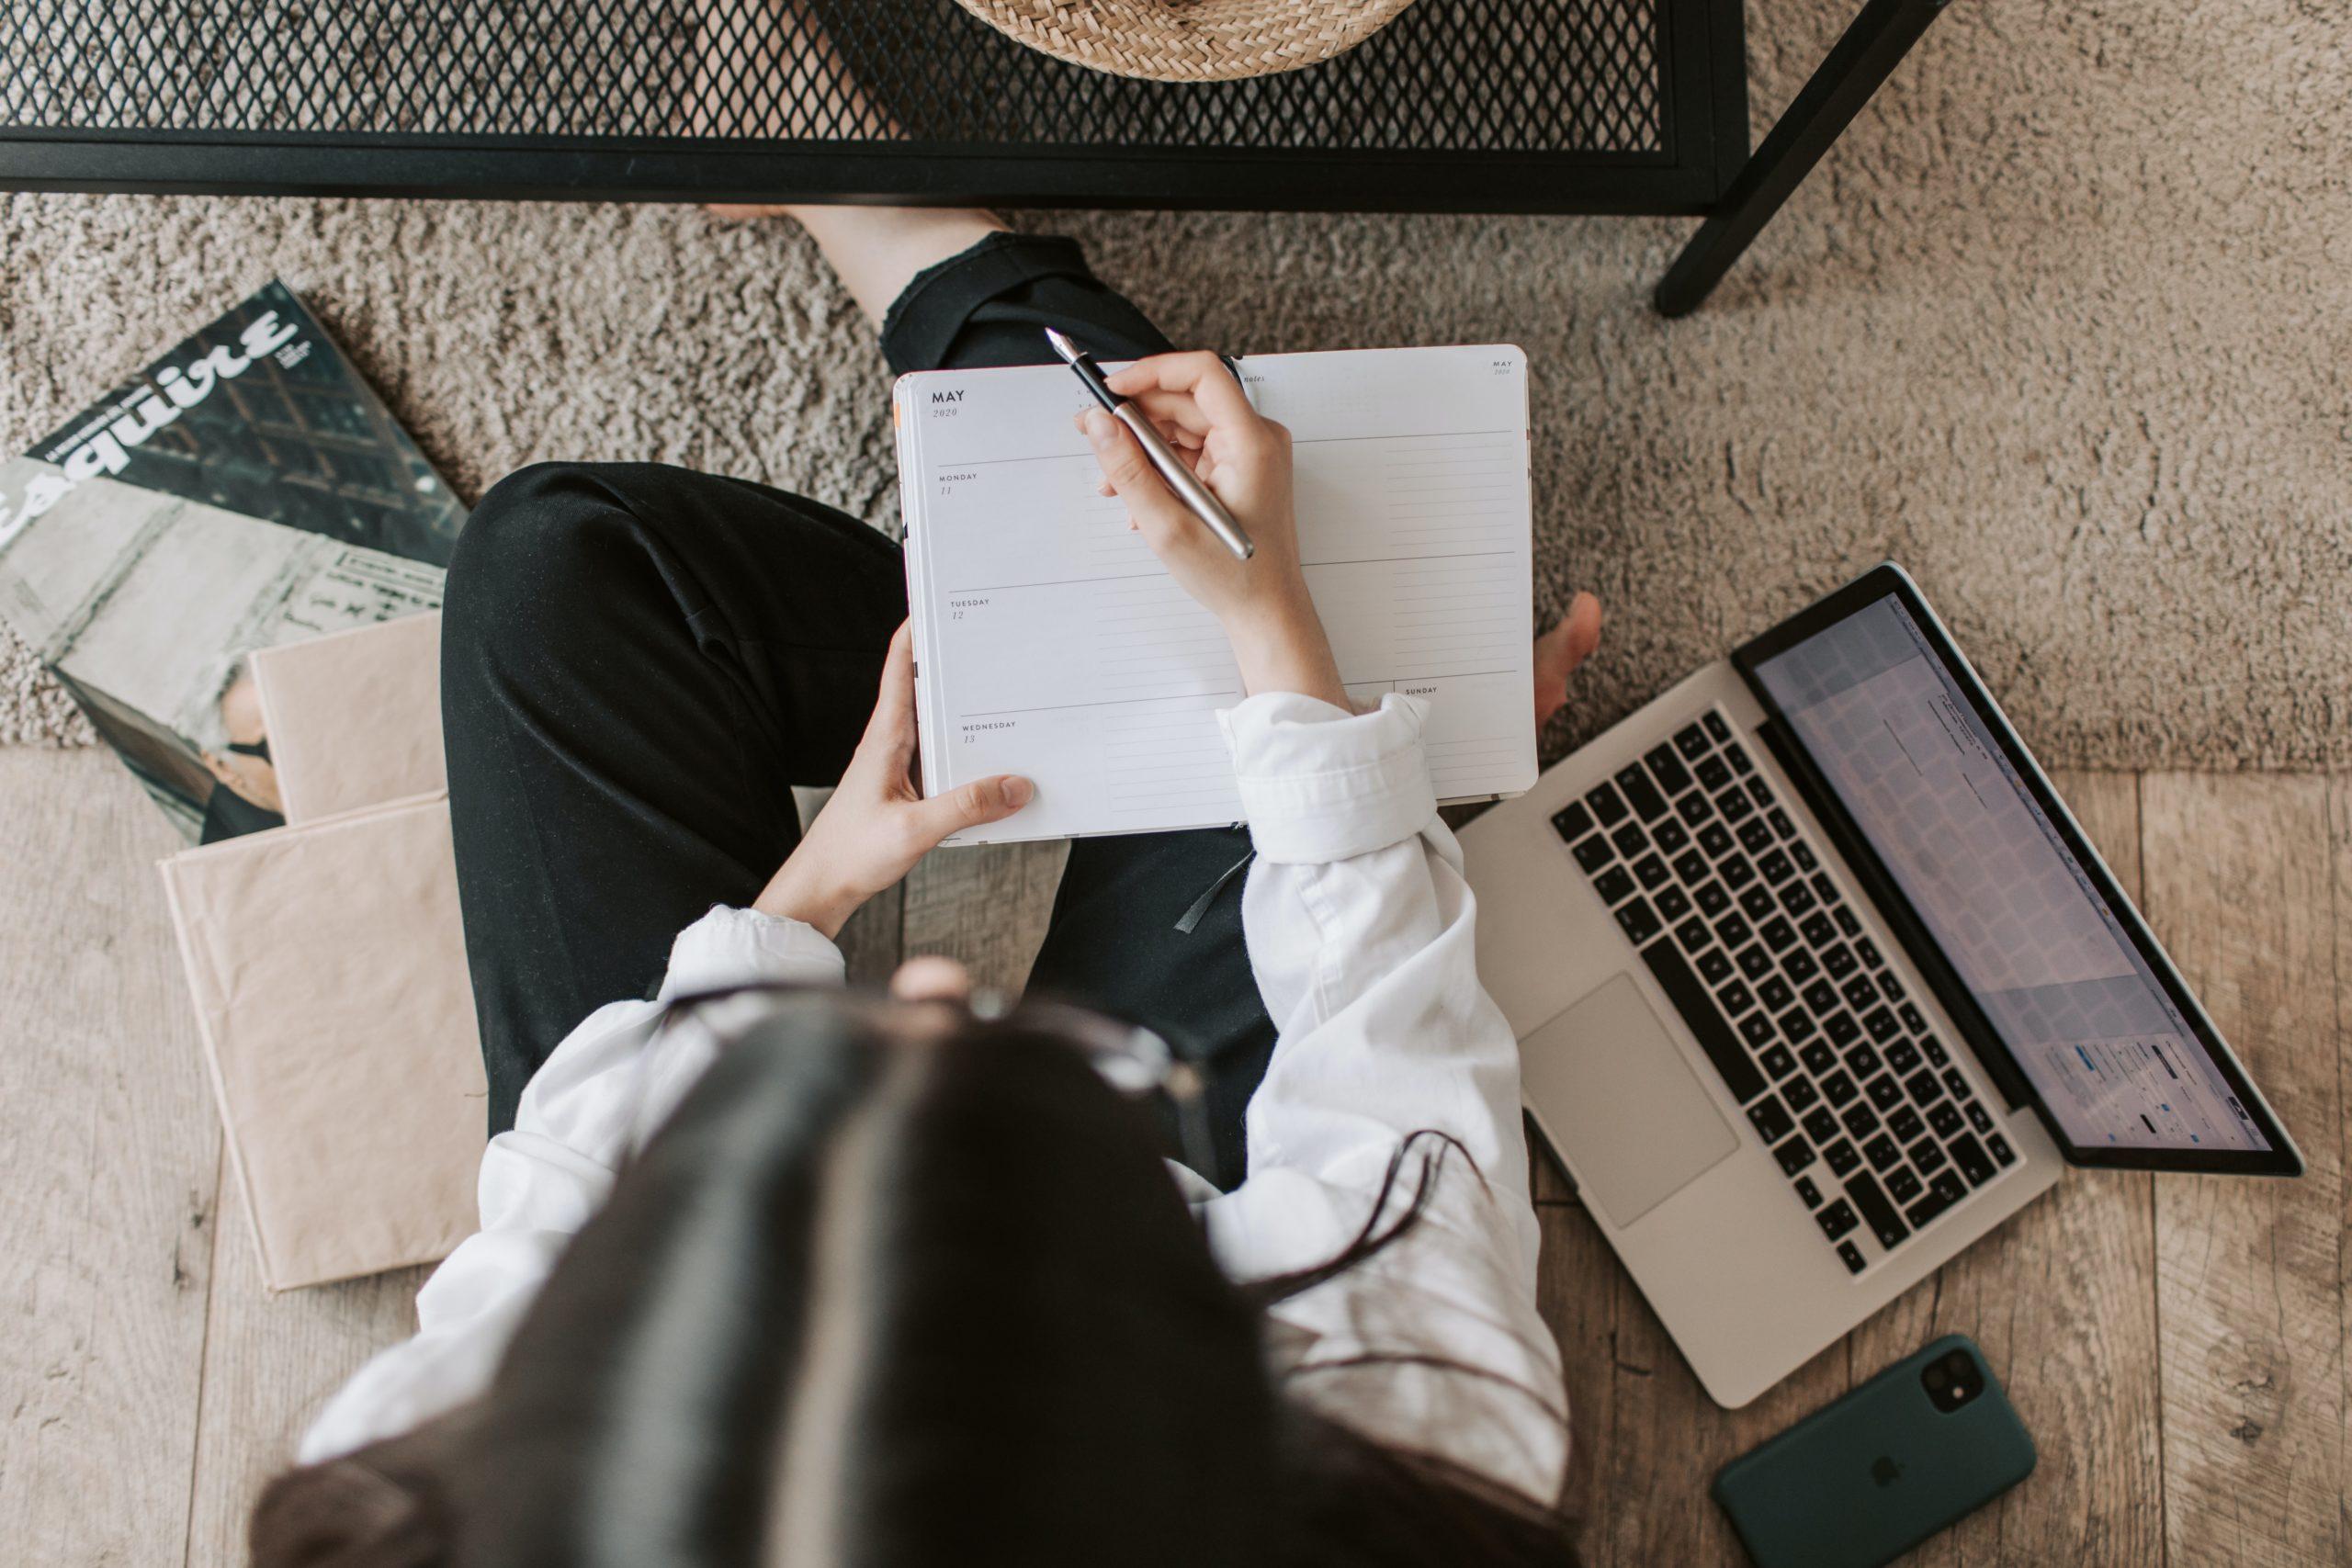 student sitting on floor working on computer